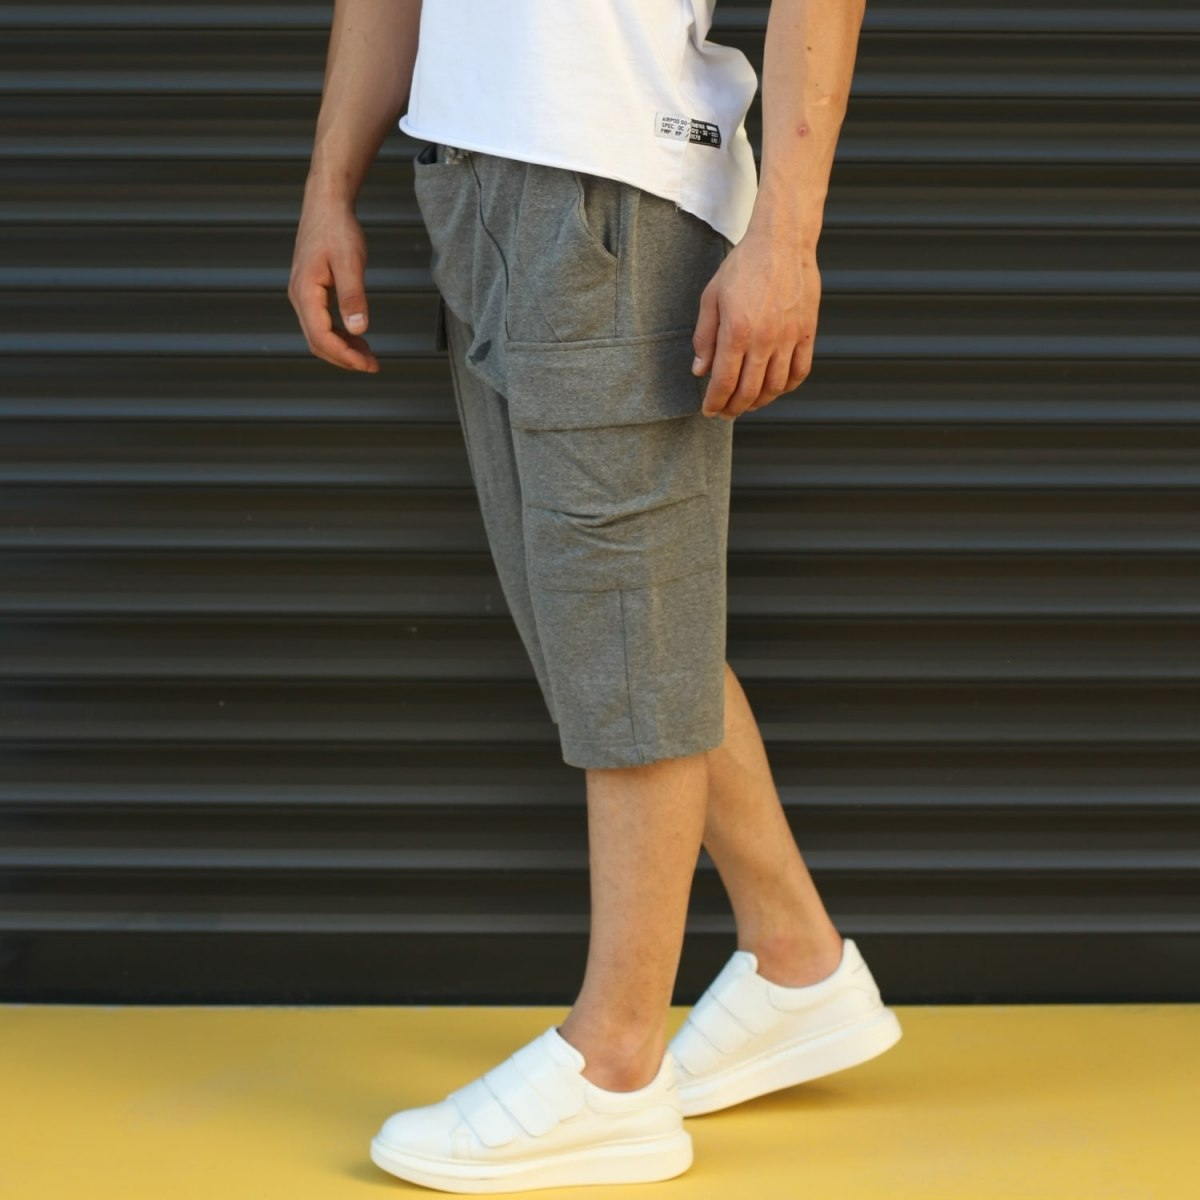 Men's Shalwar Design Fleece Sport Shorts With Side Pockets Gray Mv Premium Brand - 3